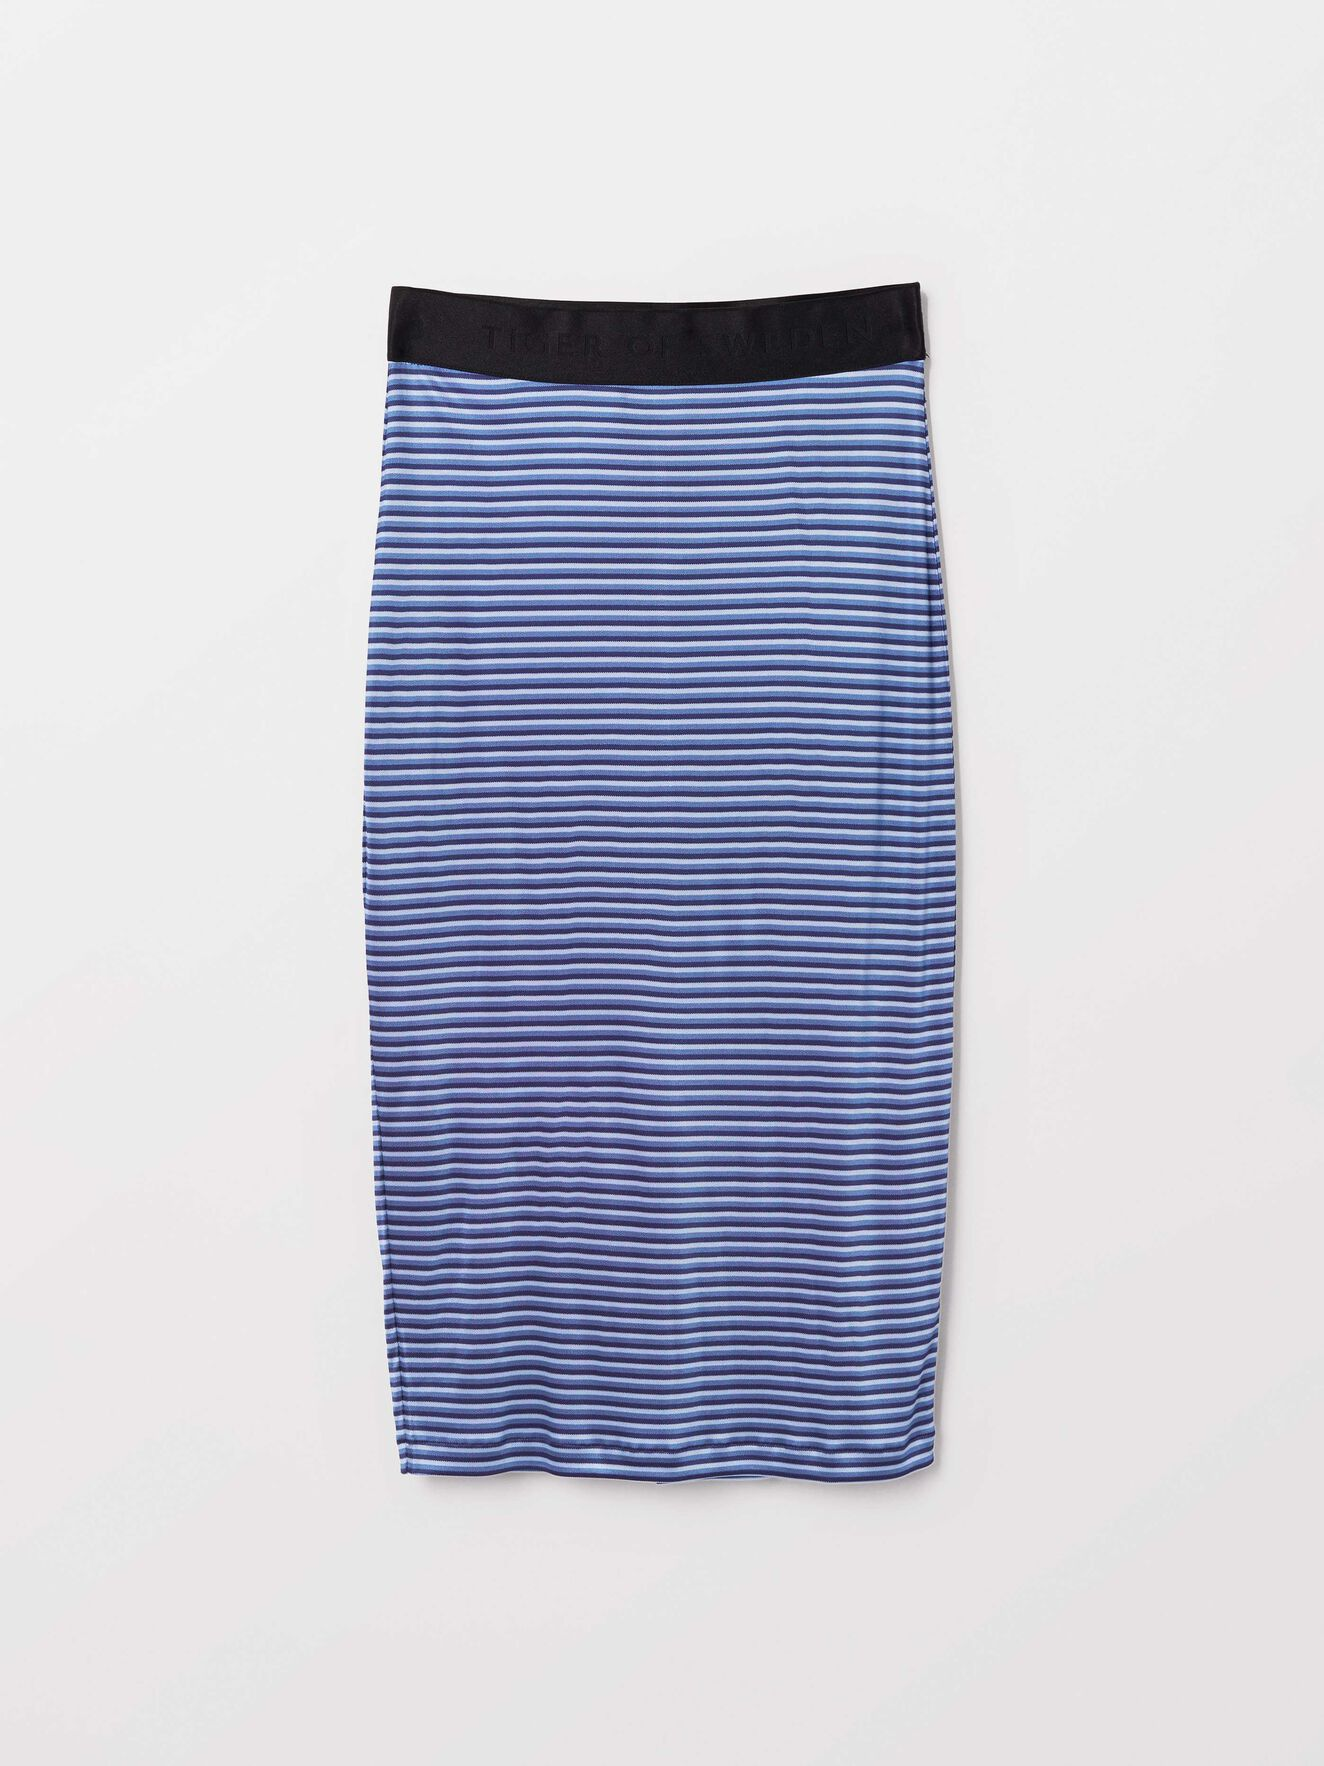 Jacelyn S Skirt in Soft blue from Tiger of Sweden